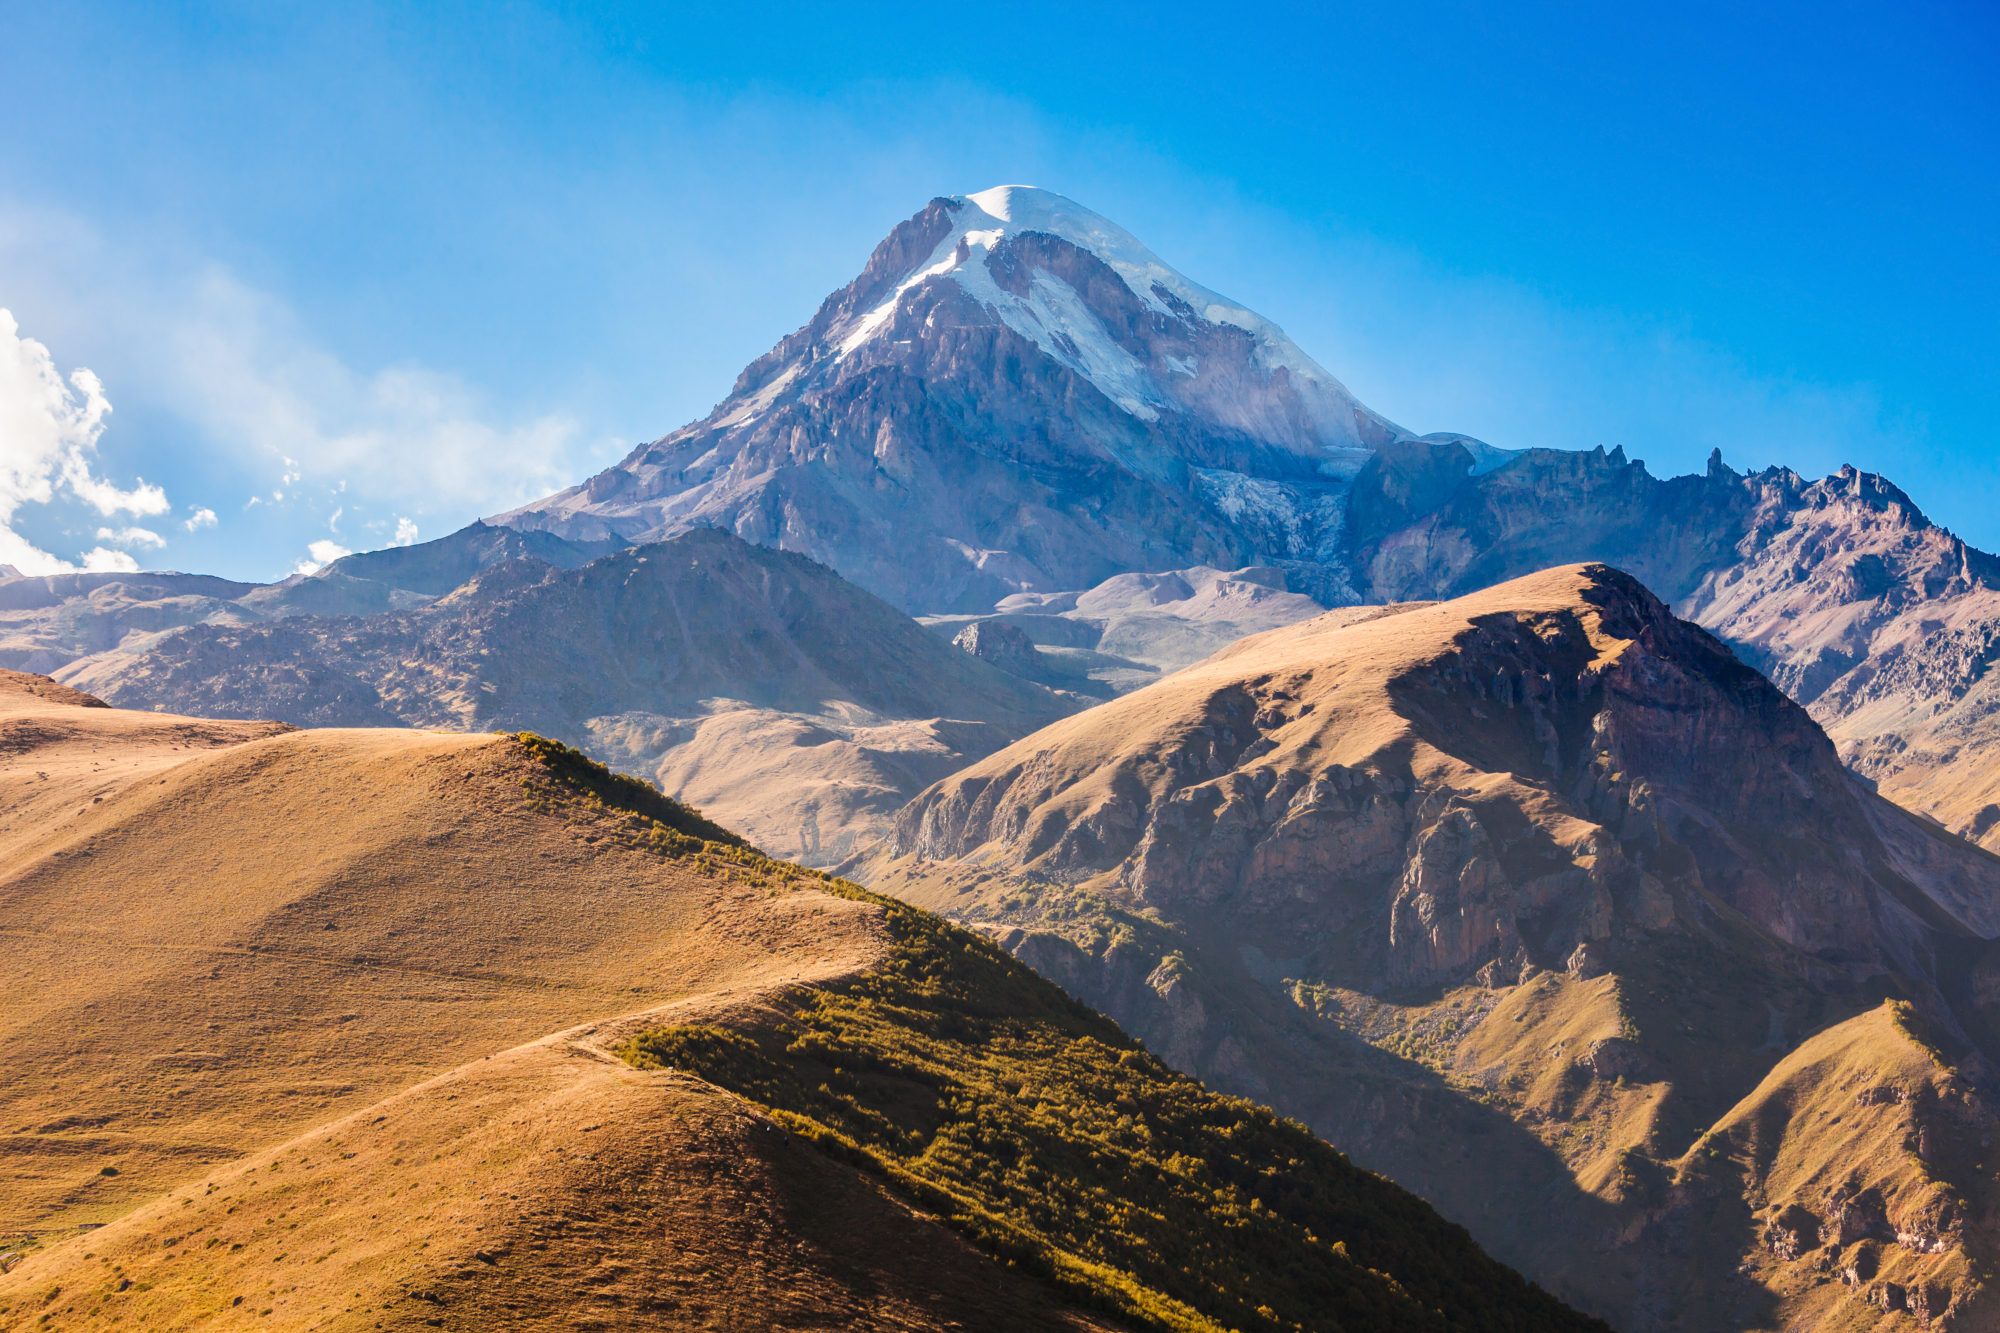 Snowy peaks of Volcano Kazbek